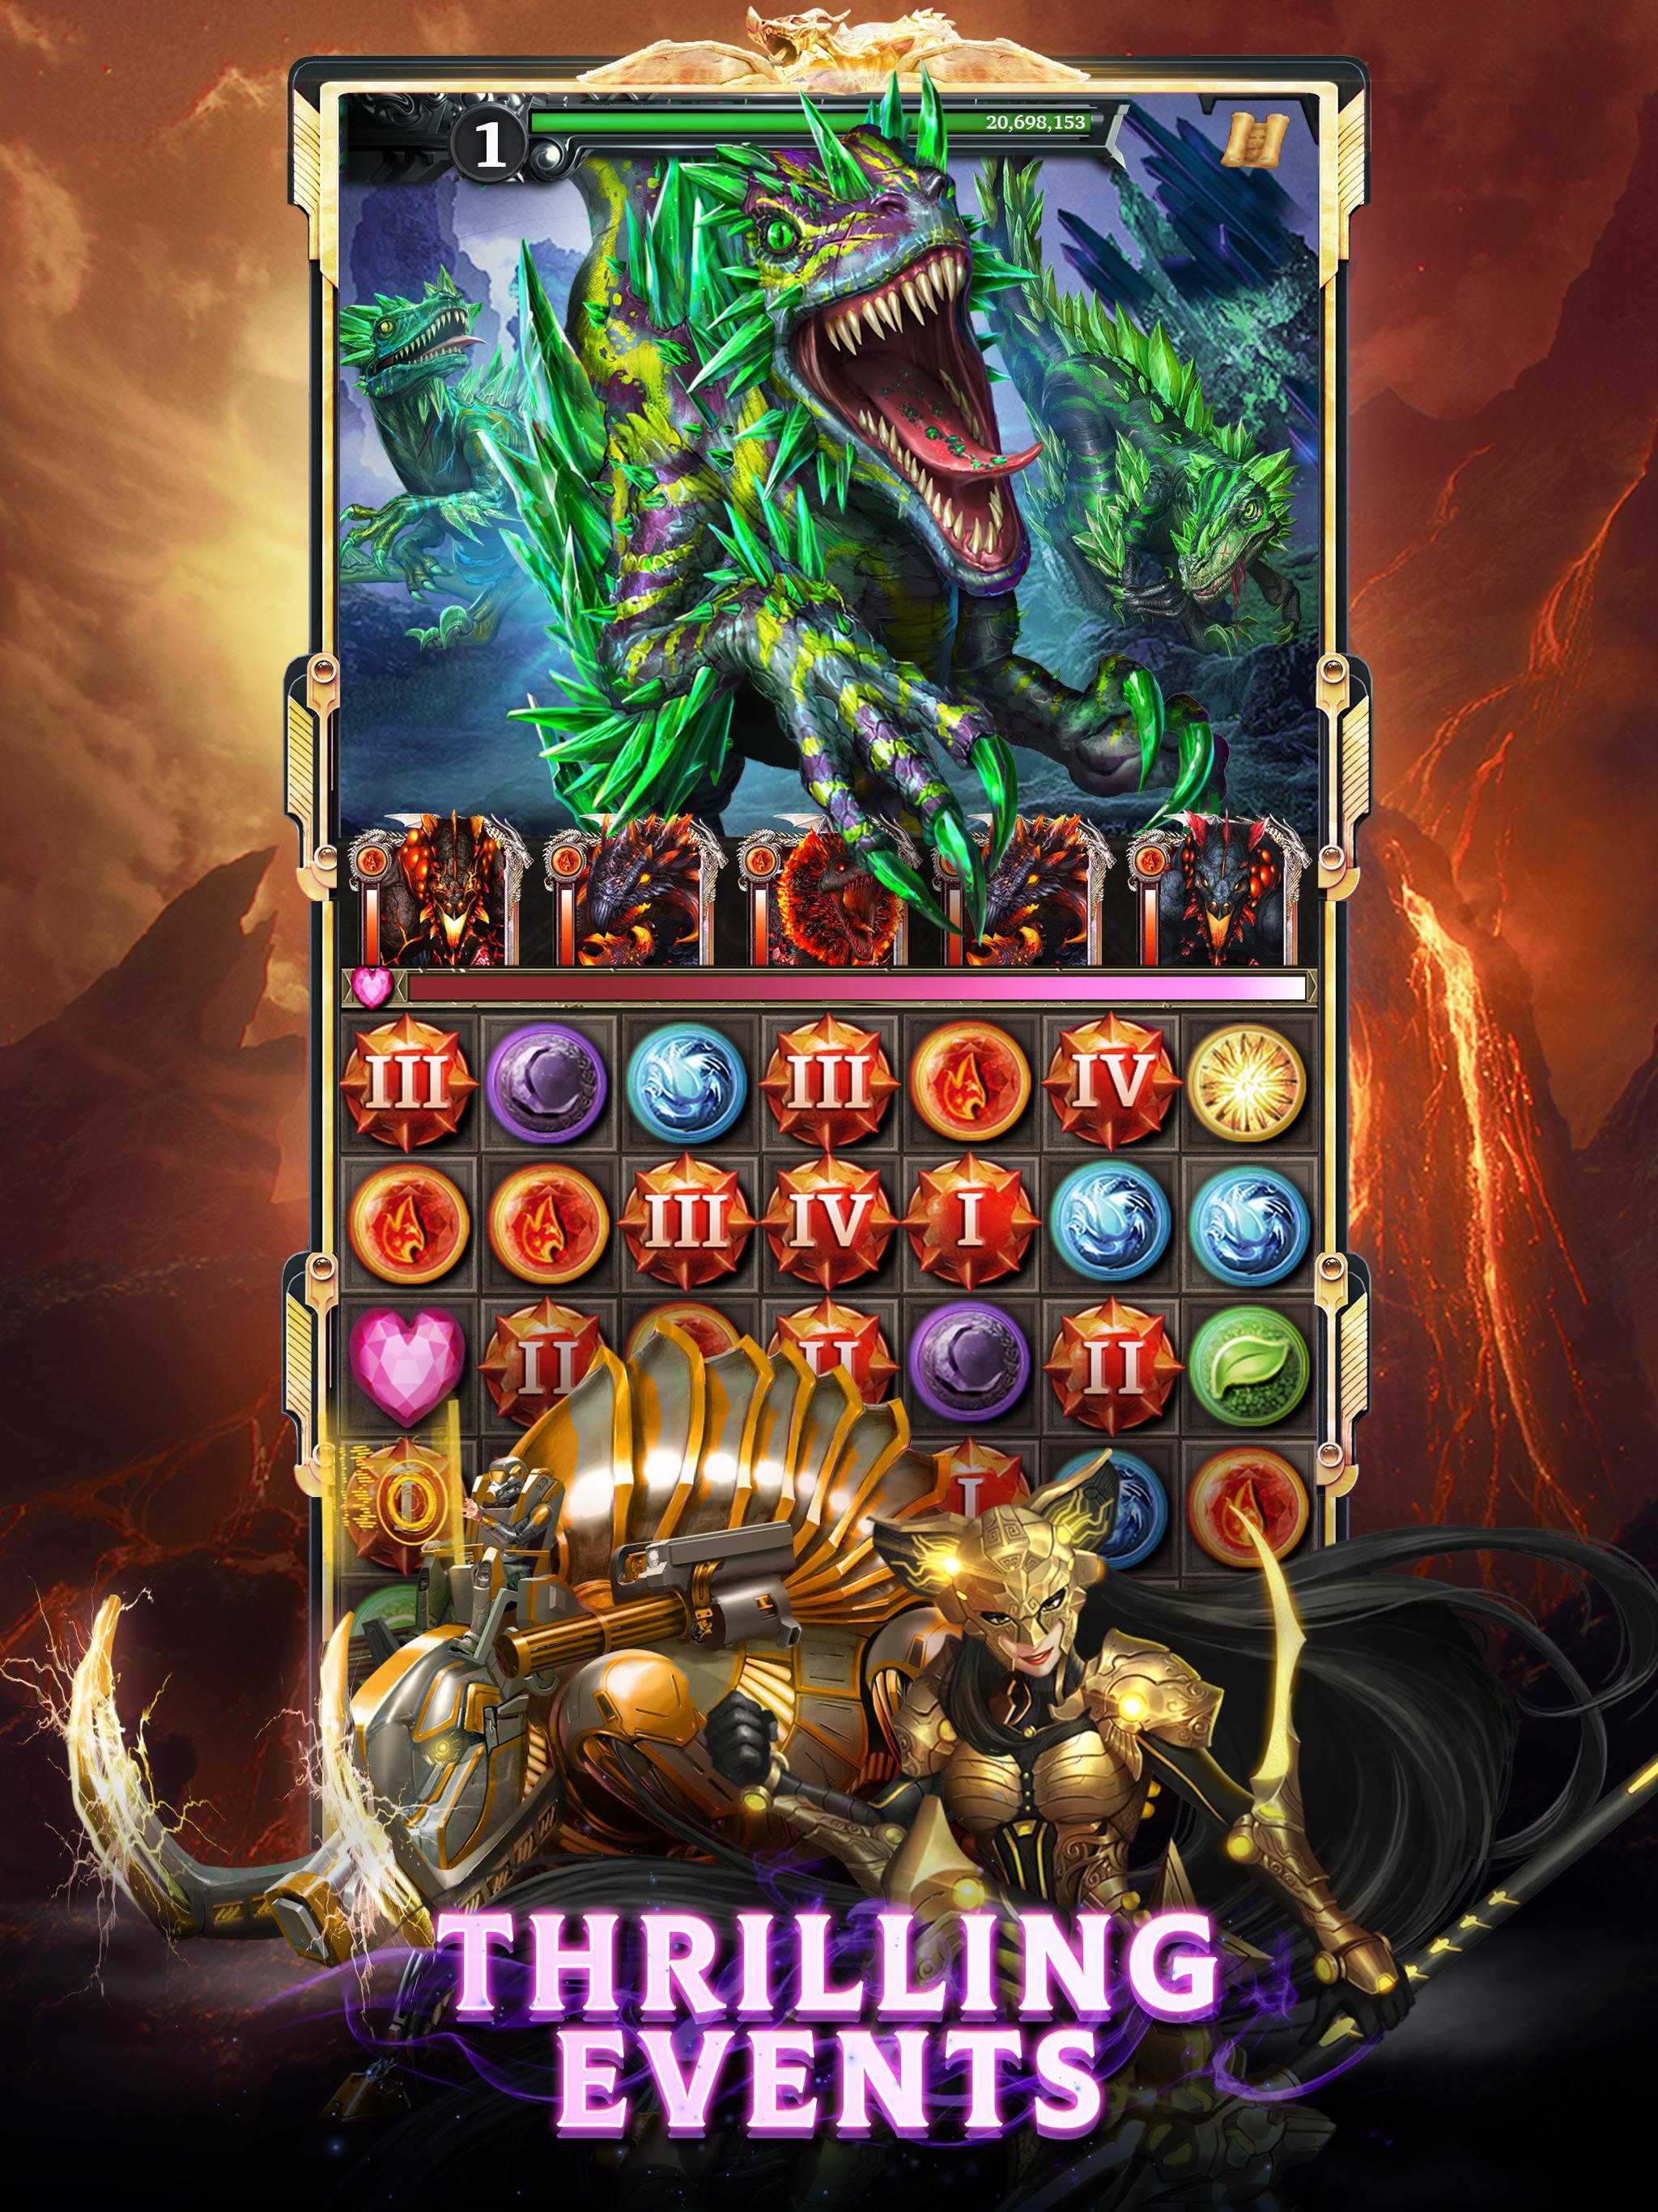 legendary royale 3 apk free download